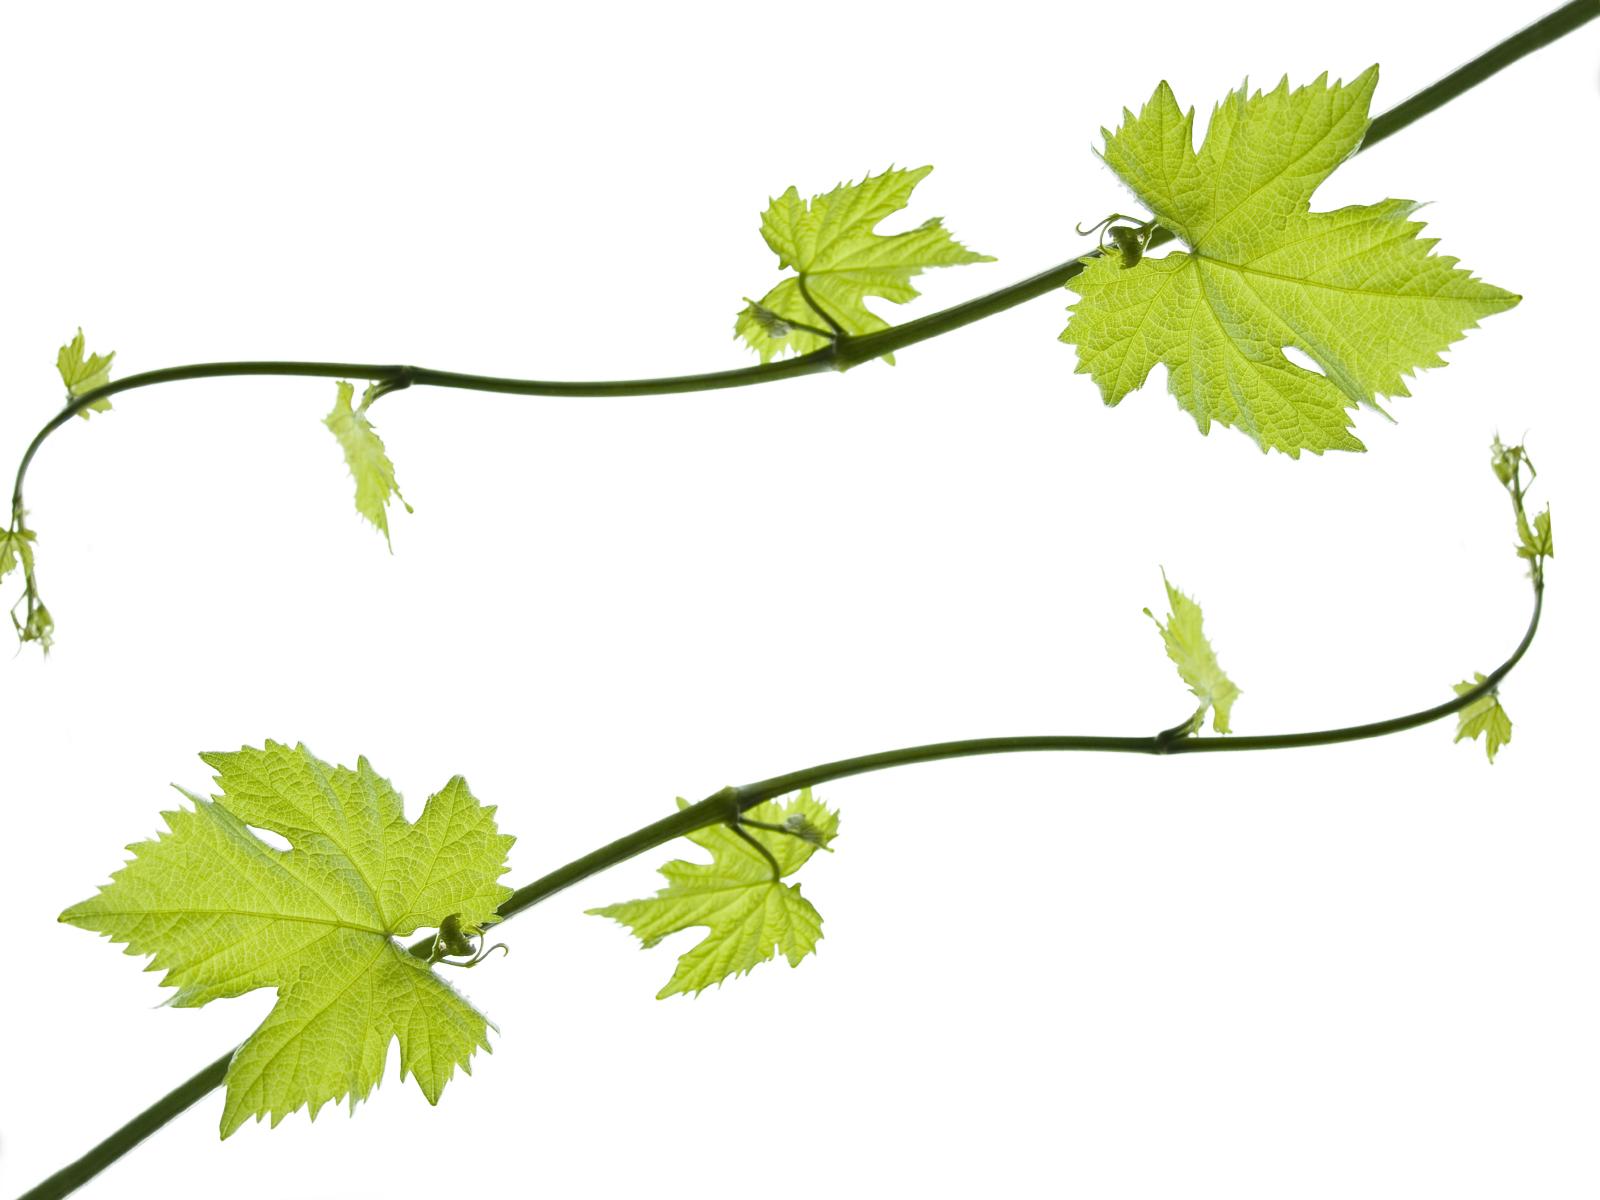 Grapes clip art grapes clipart fans 4